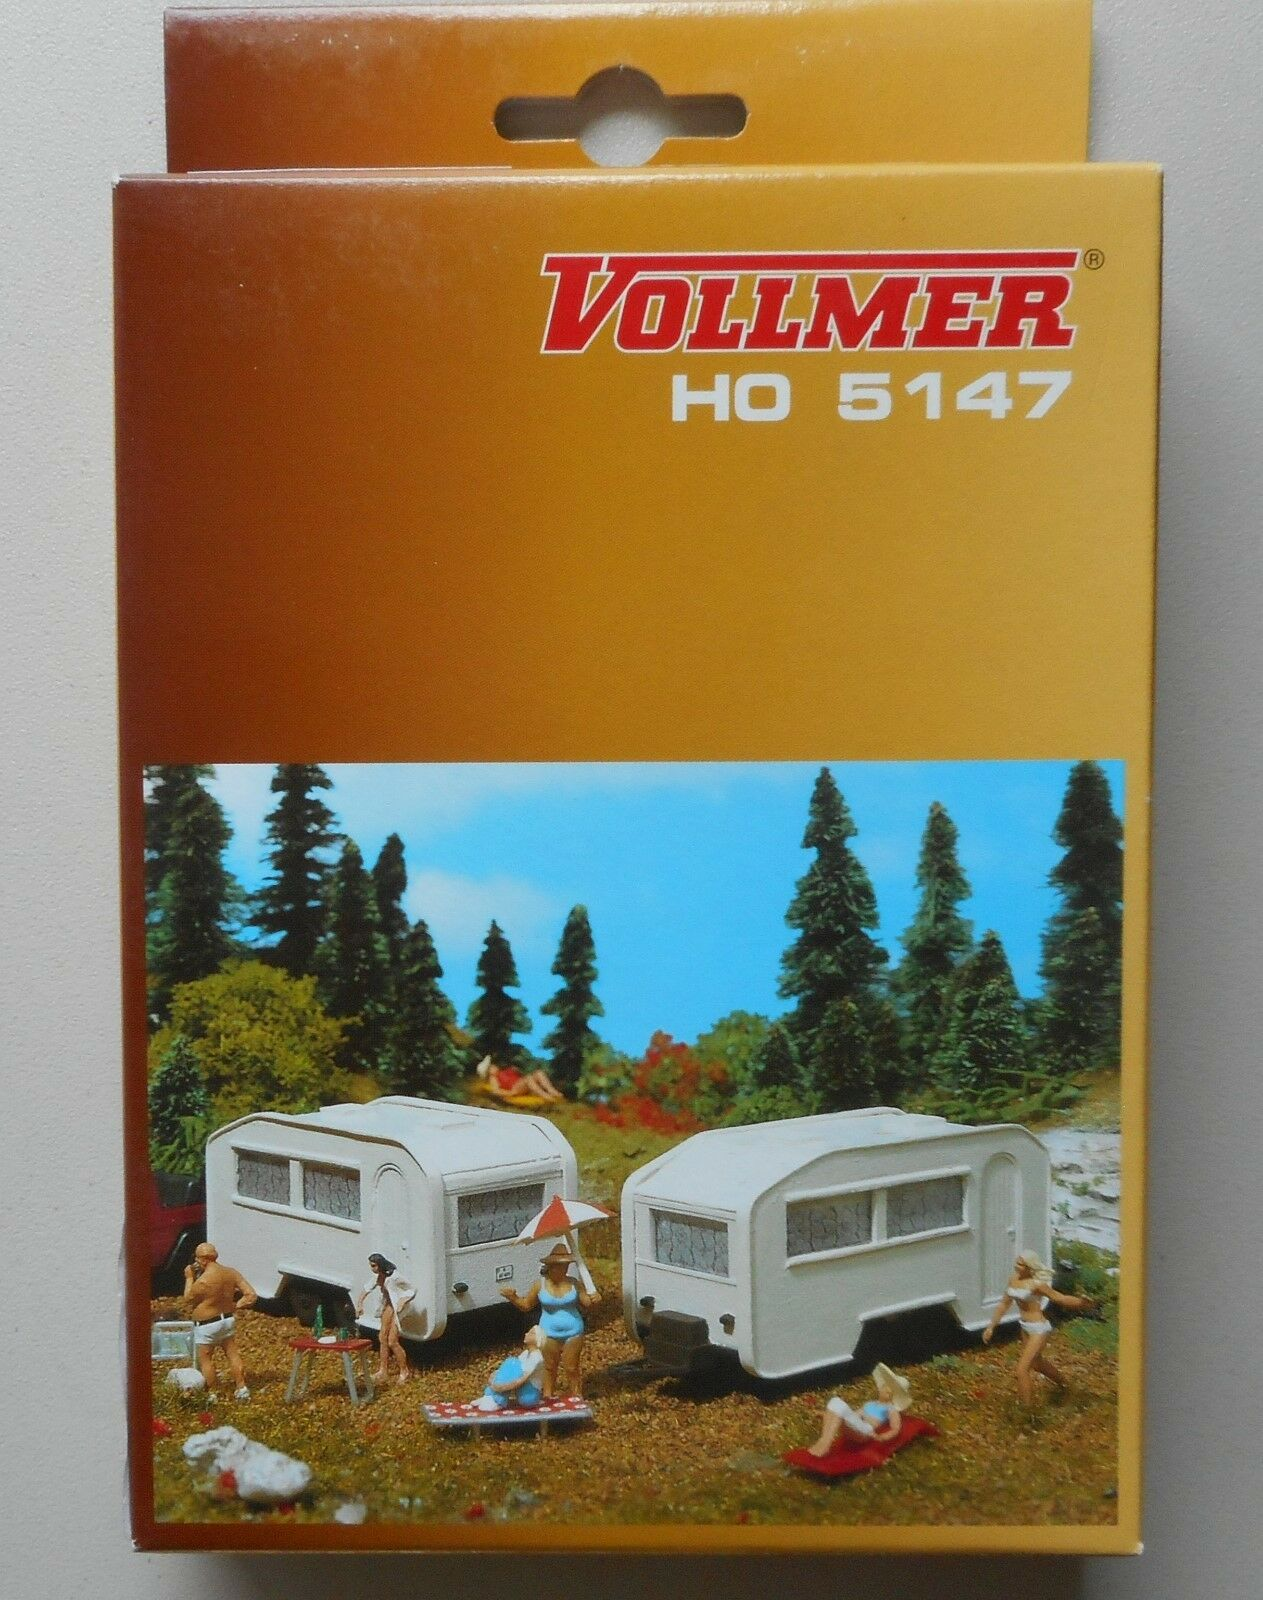 Vollmer H0 45713 Bauhütte